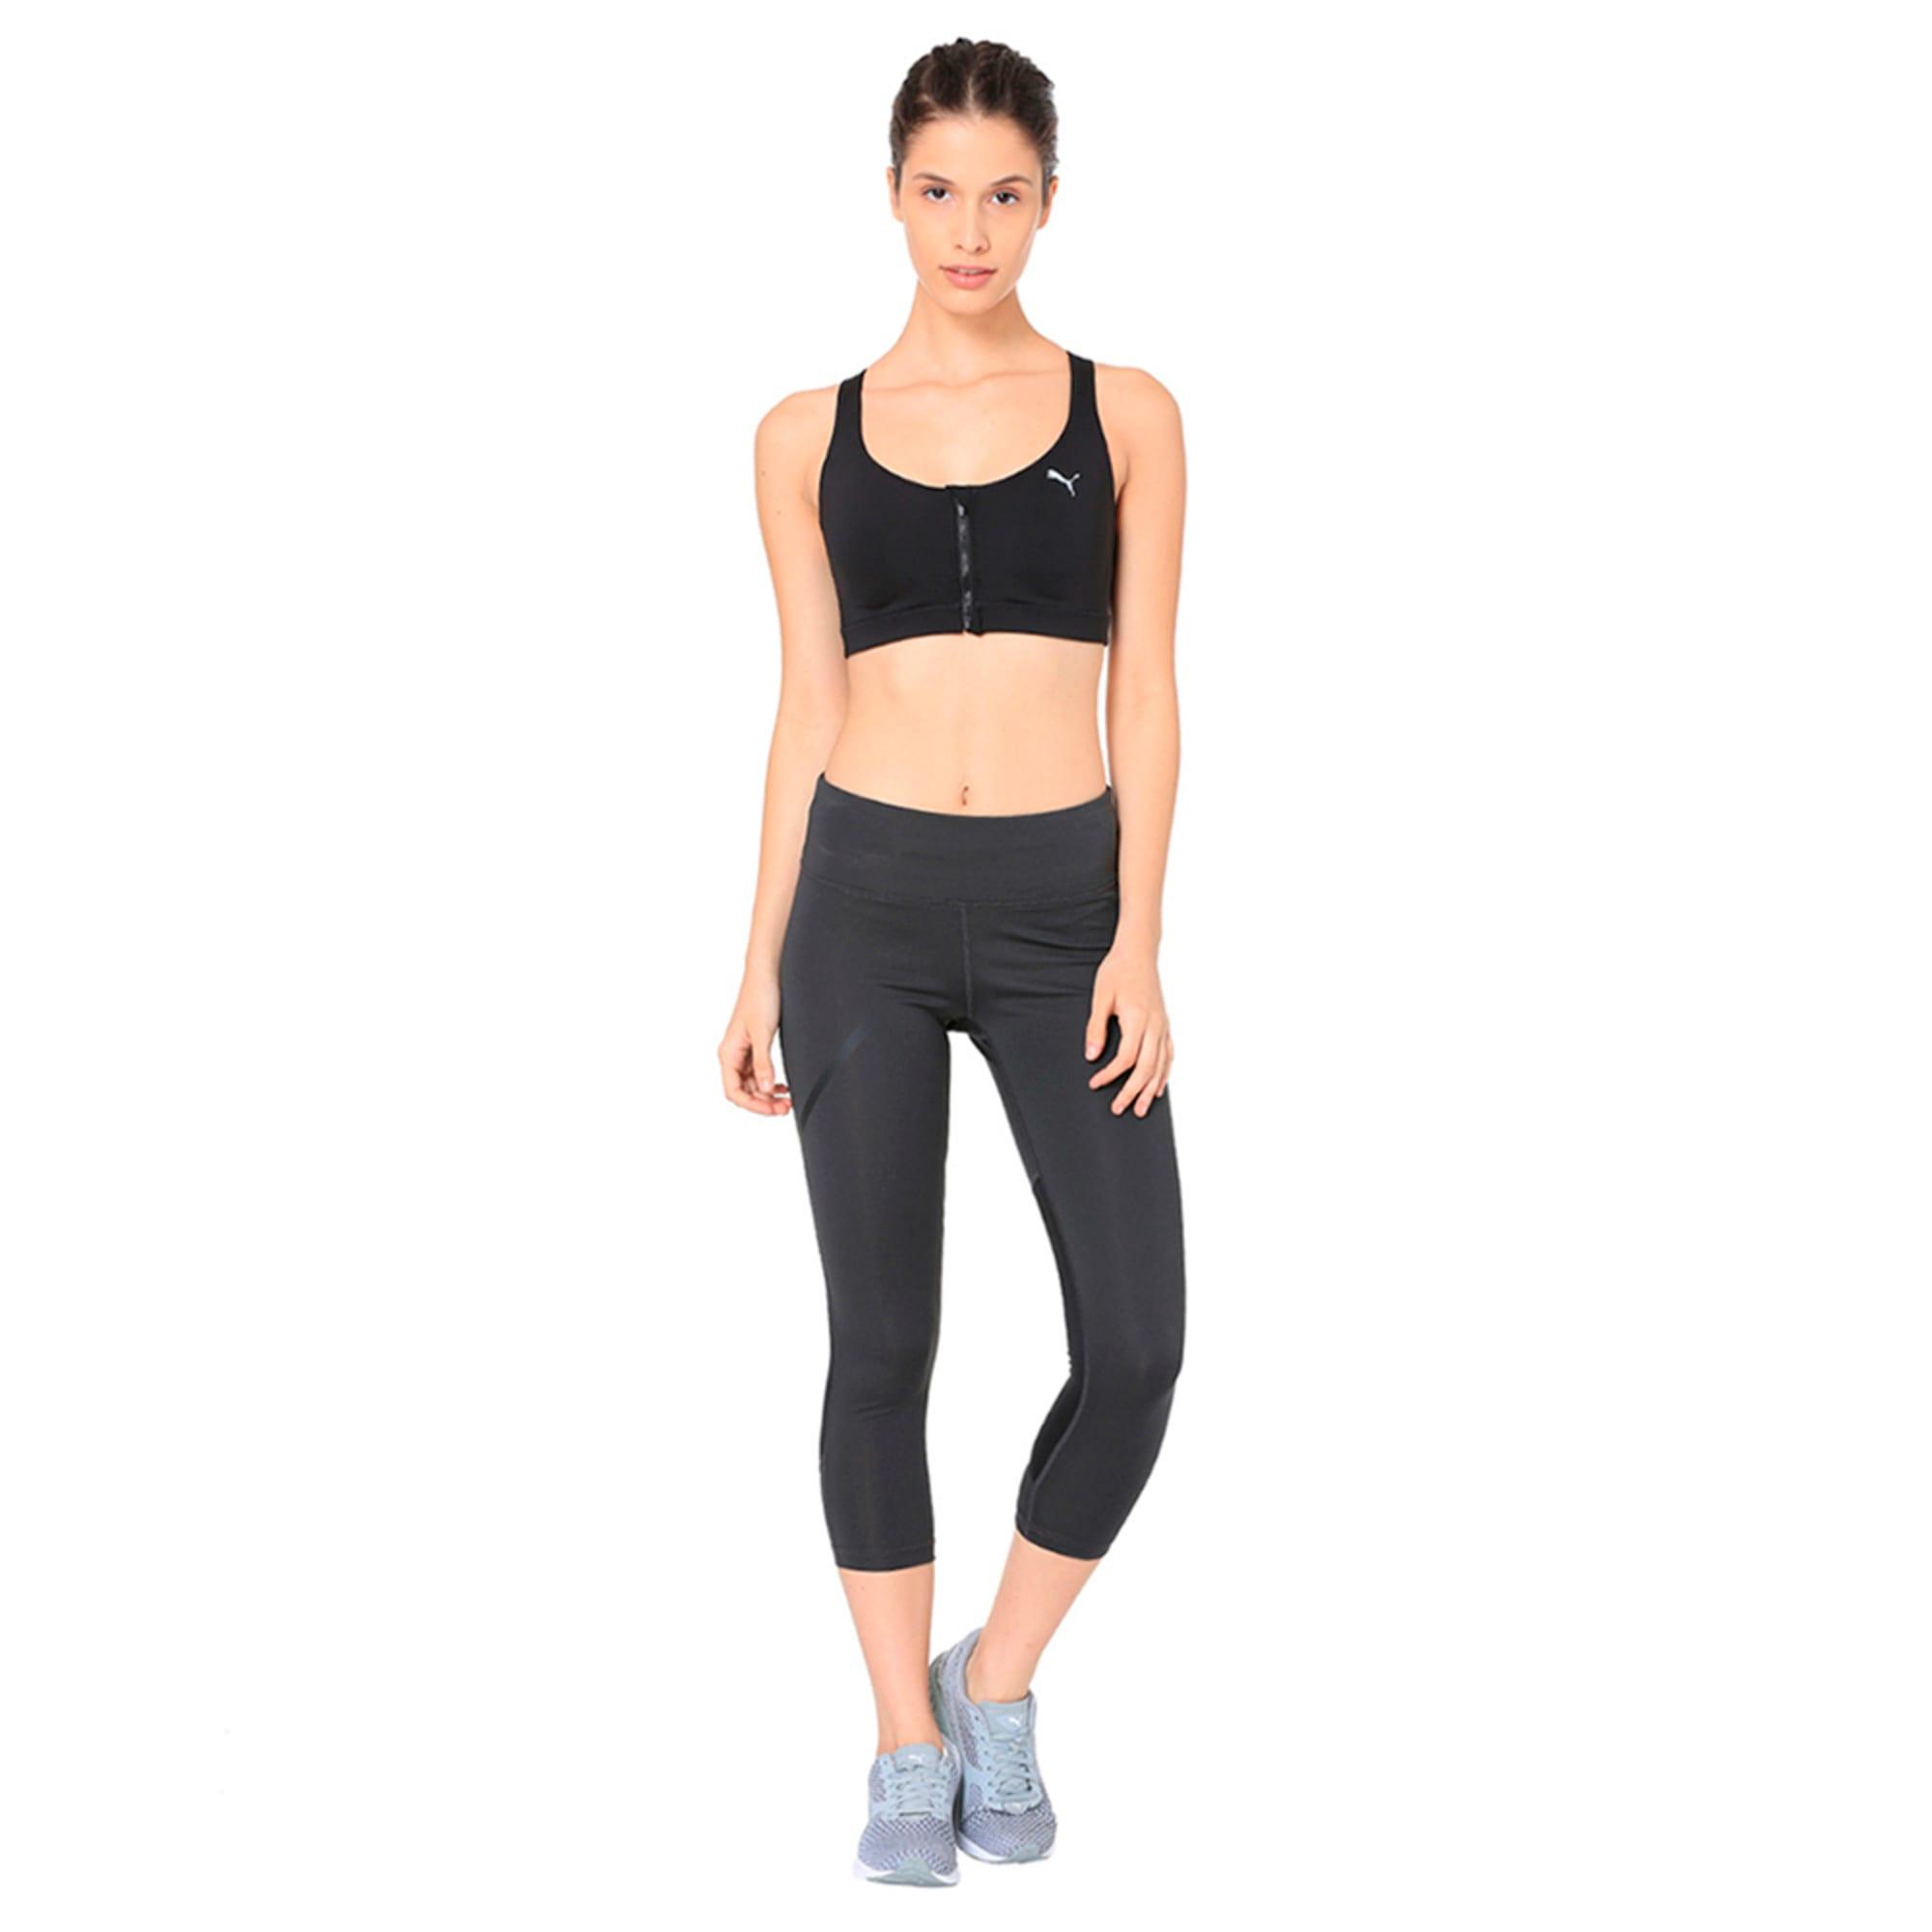 Thumbnail 6 of Speed 3/4 Women's Training Tights, Dark Gray Heather-Puma Black, medium-IND